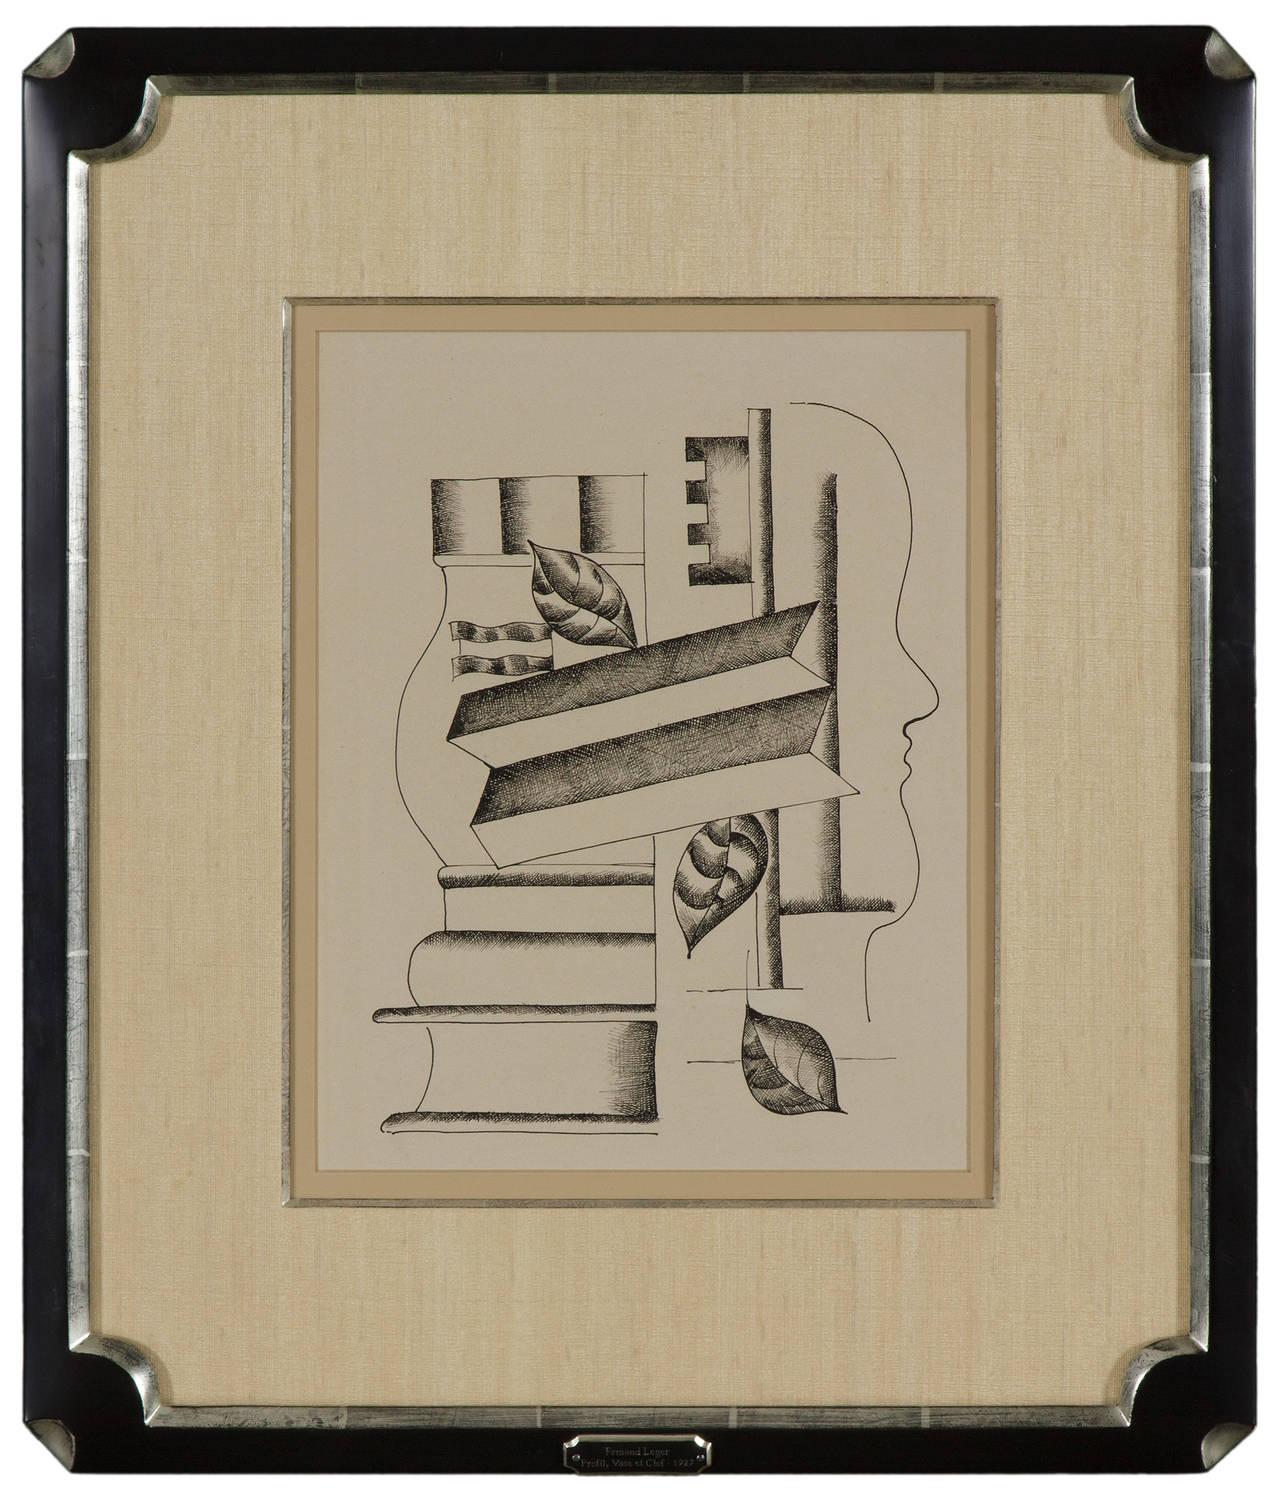 Profil, Vase et Clef - Art by Fernand Léger